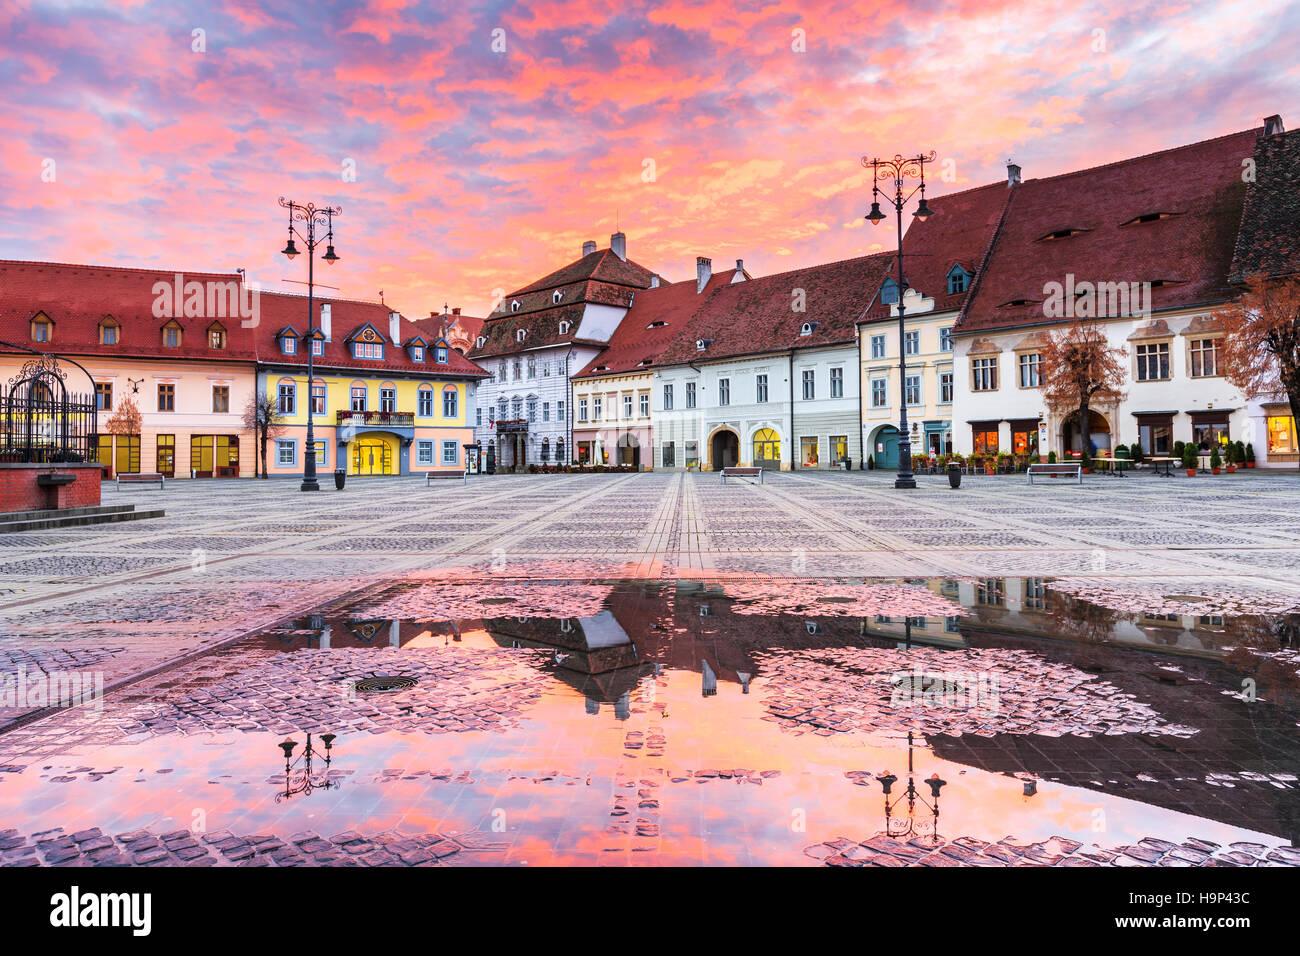 Sibiu, Rumänien. Großen Platz. Transylvania mittelalterliche Stadt. Stockfoto